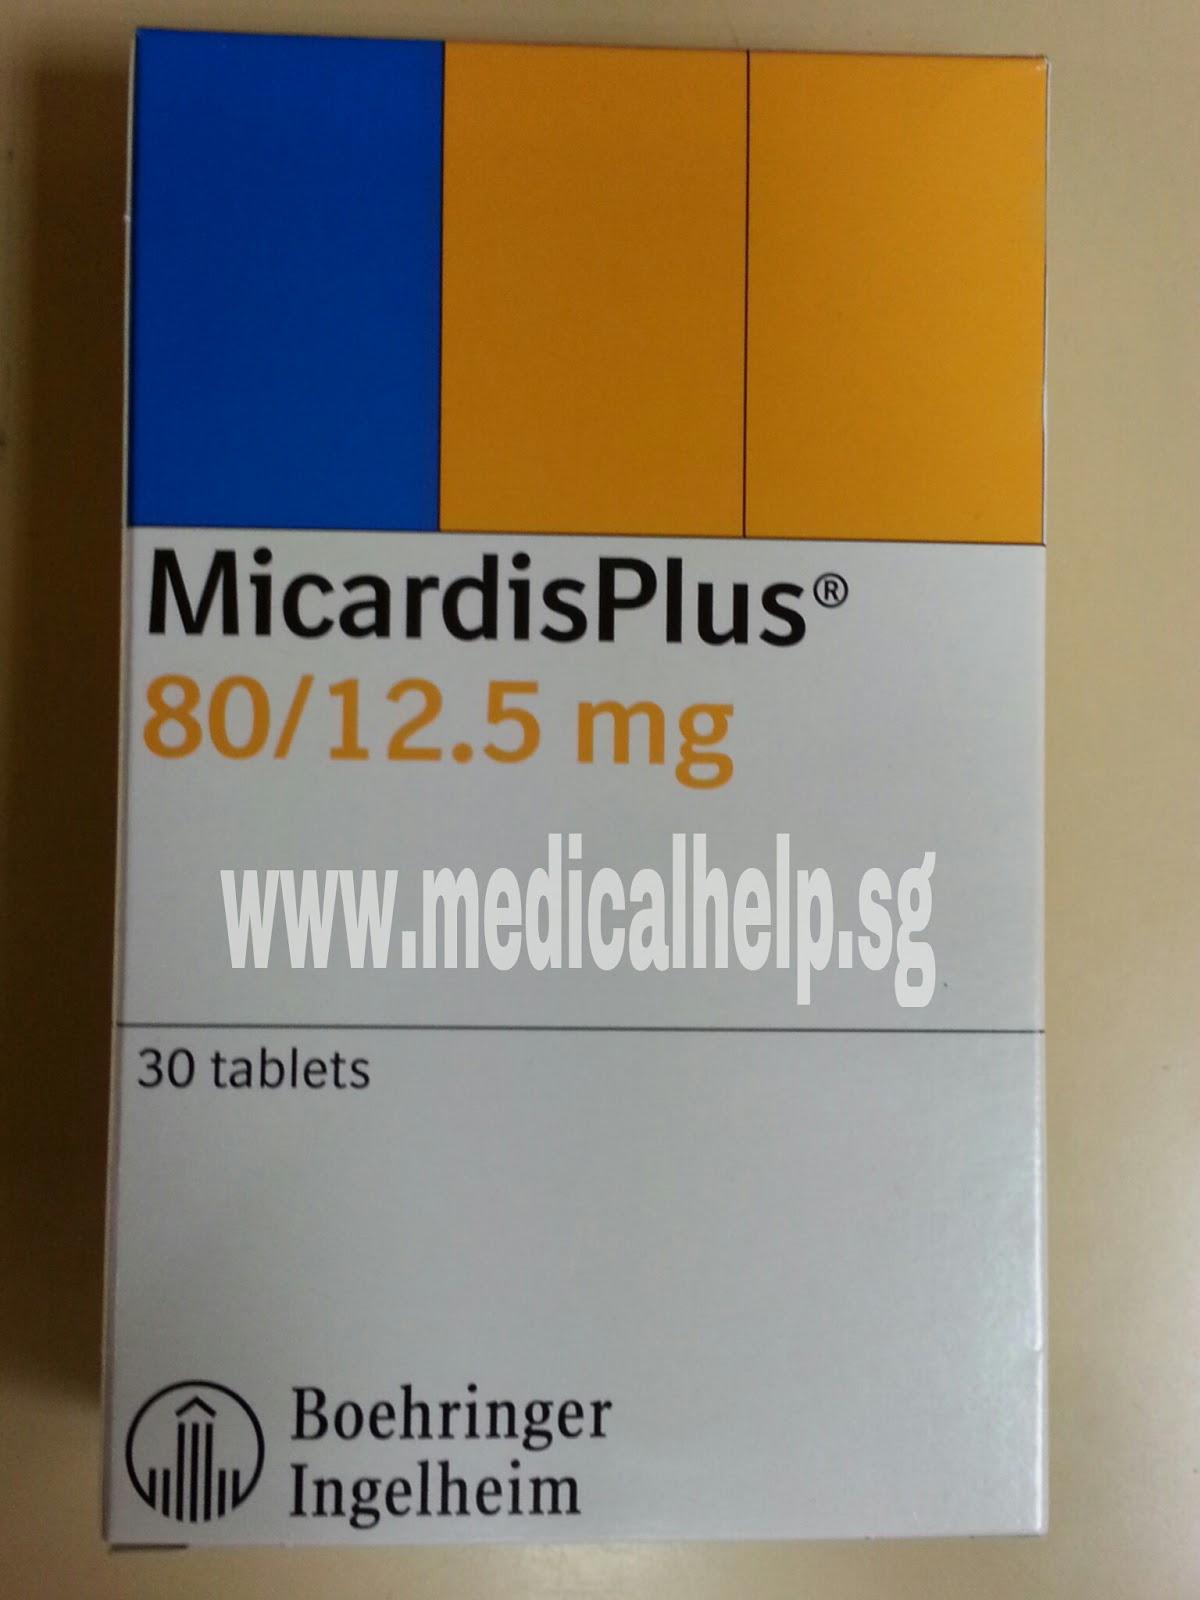 ciprofloxacin hydrochloride ophthalmic solution 0.3 for pink eye dosage